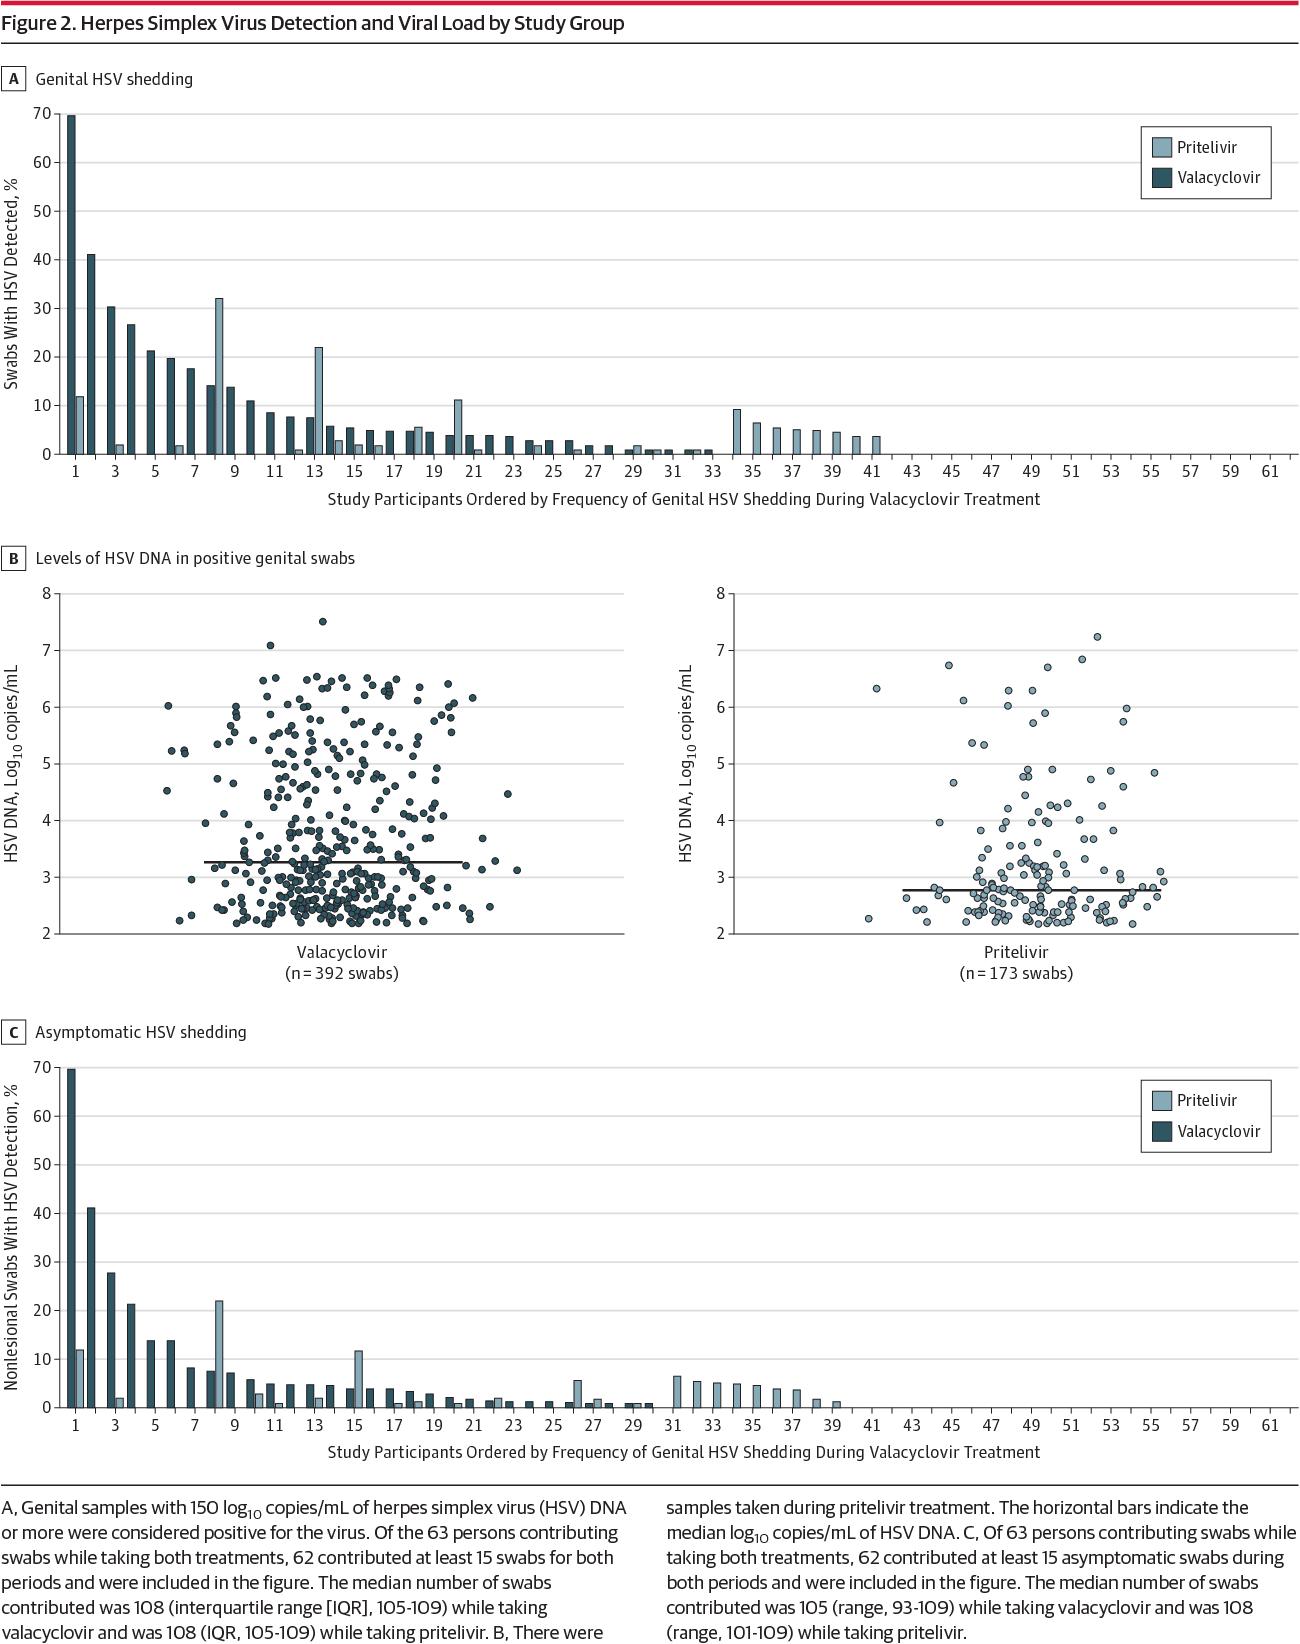 Effect of Pritelivir Compared With Valacyclovir on Genital